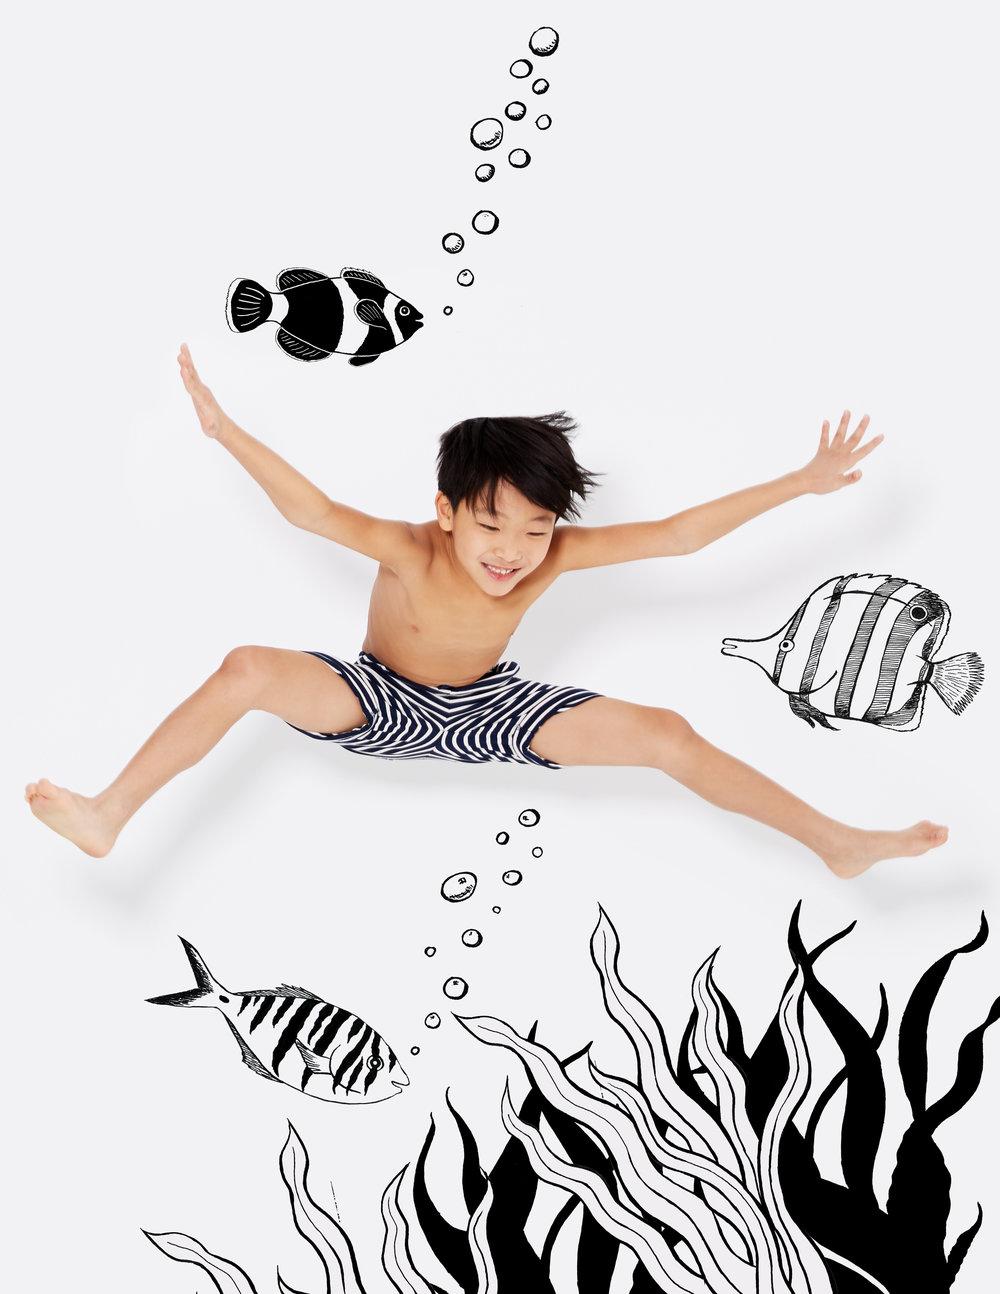 Kids_Marketing_Americana_349_1099728450-AC-copy.jpg